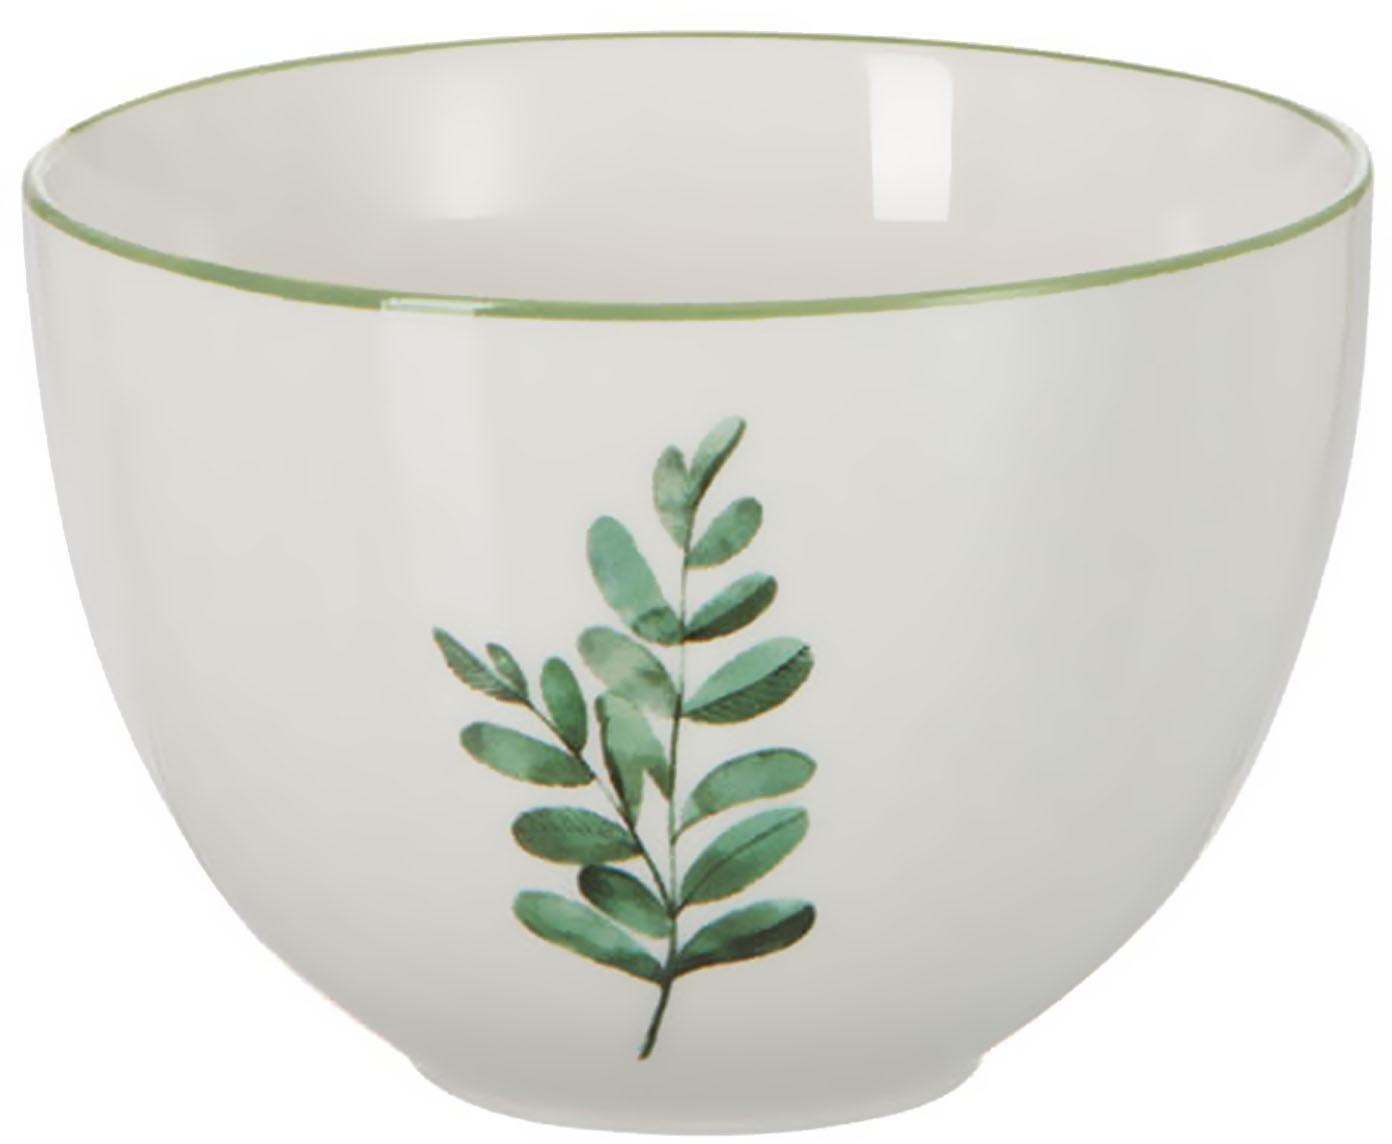 Miseczka Eukalyptus, 6 szt., Porcelana, Biały, zielony, Ø 12 cm